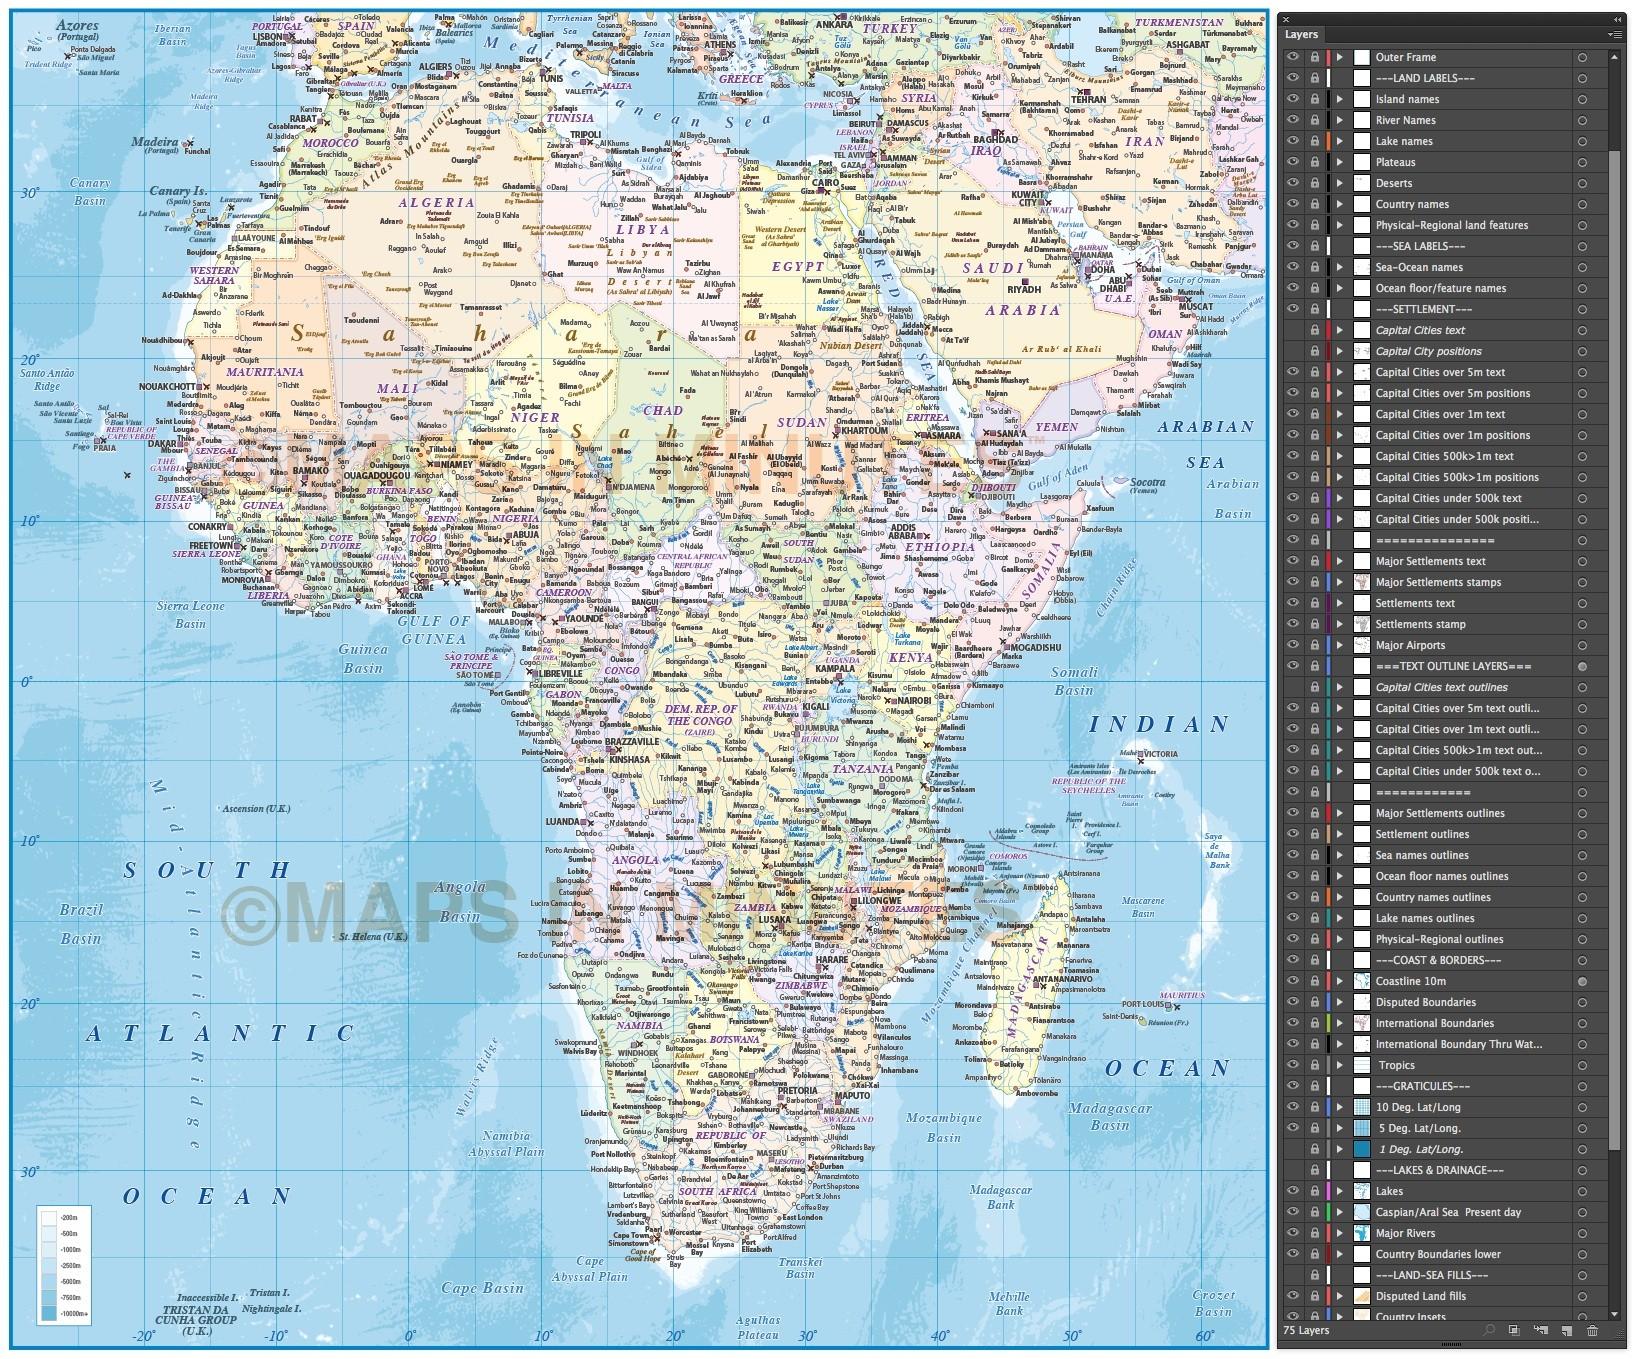 Africa Vector Map Illustrator Cs Pdf Formats Political Insets